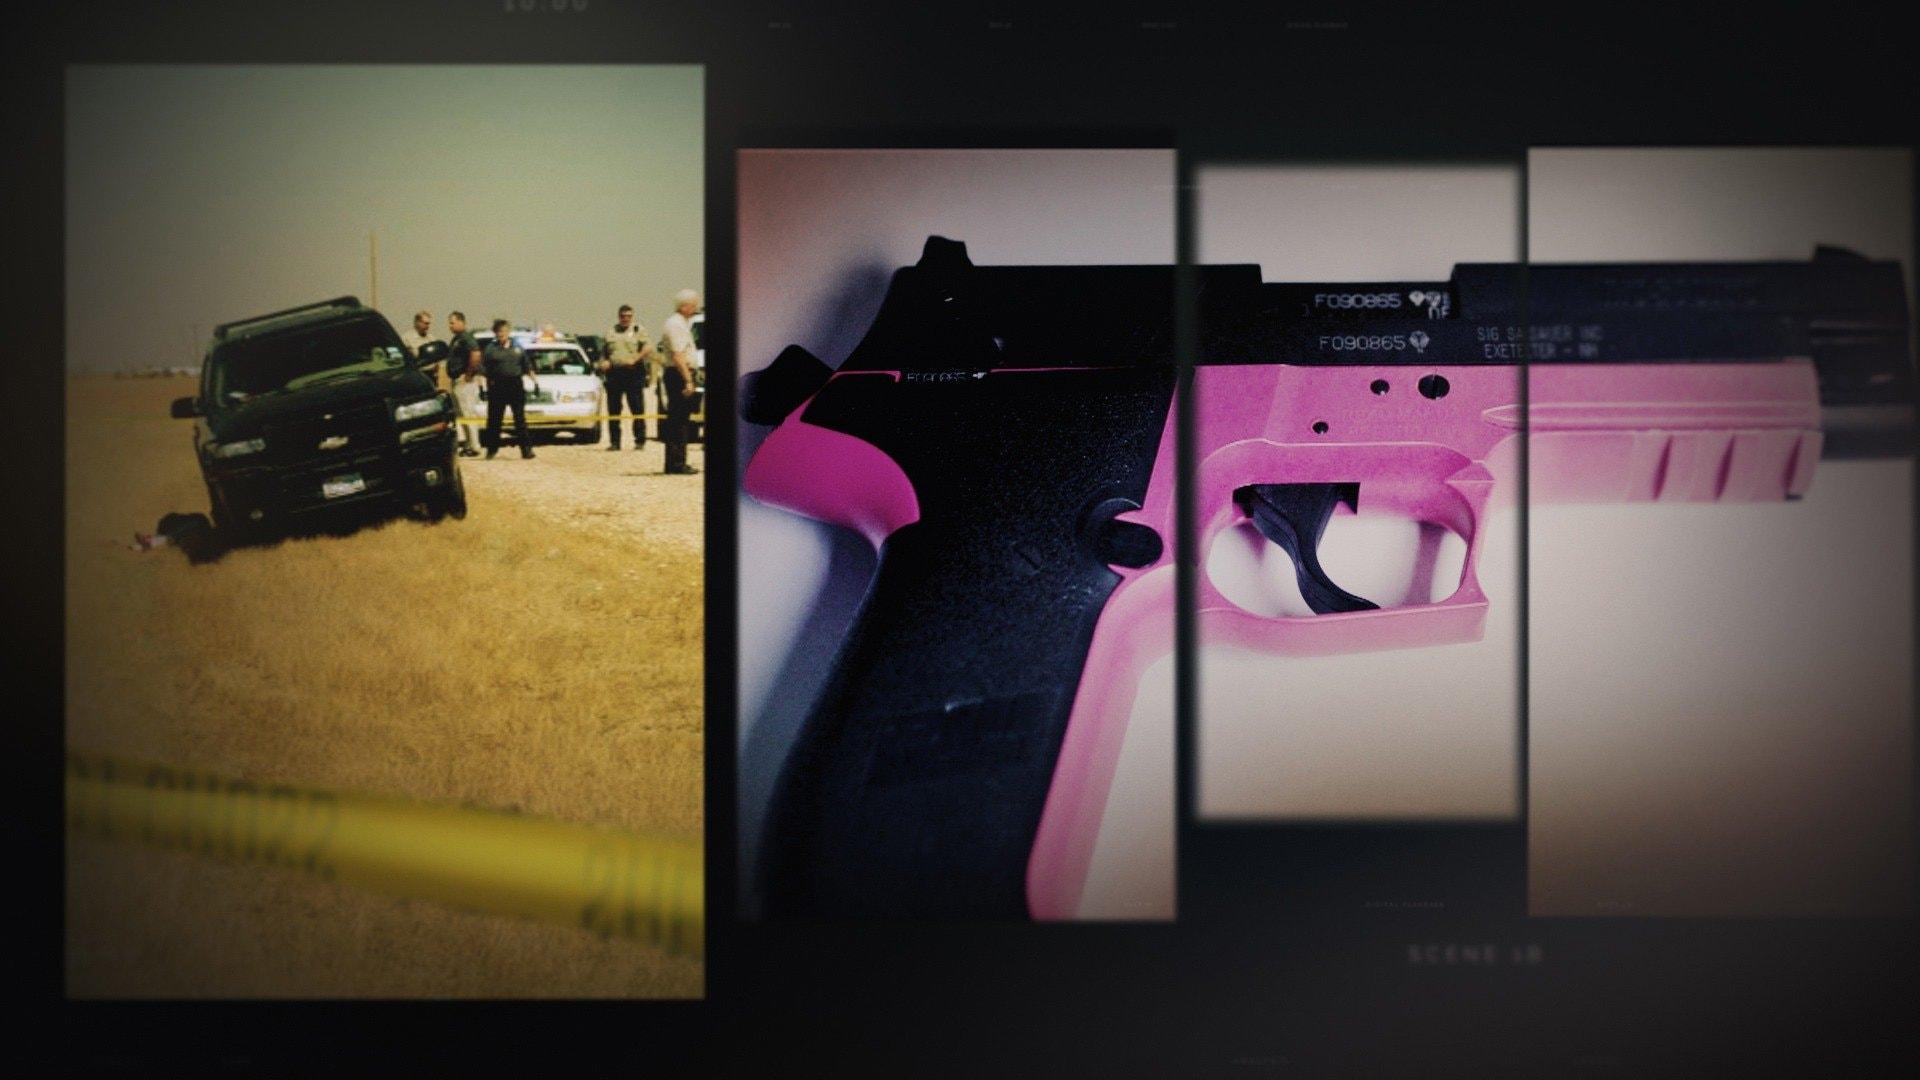 The Pink Gun Mystery